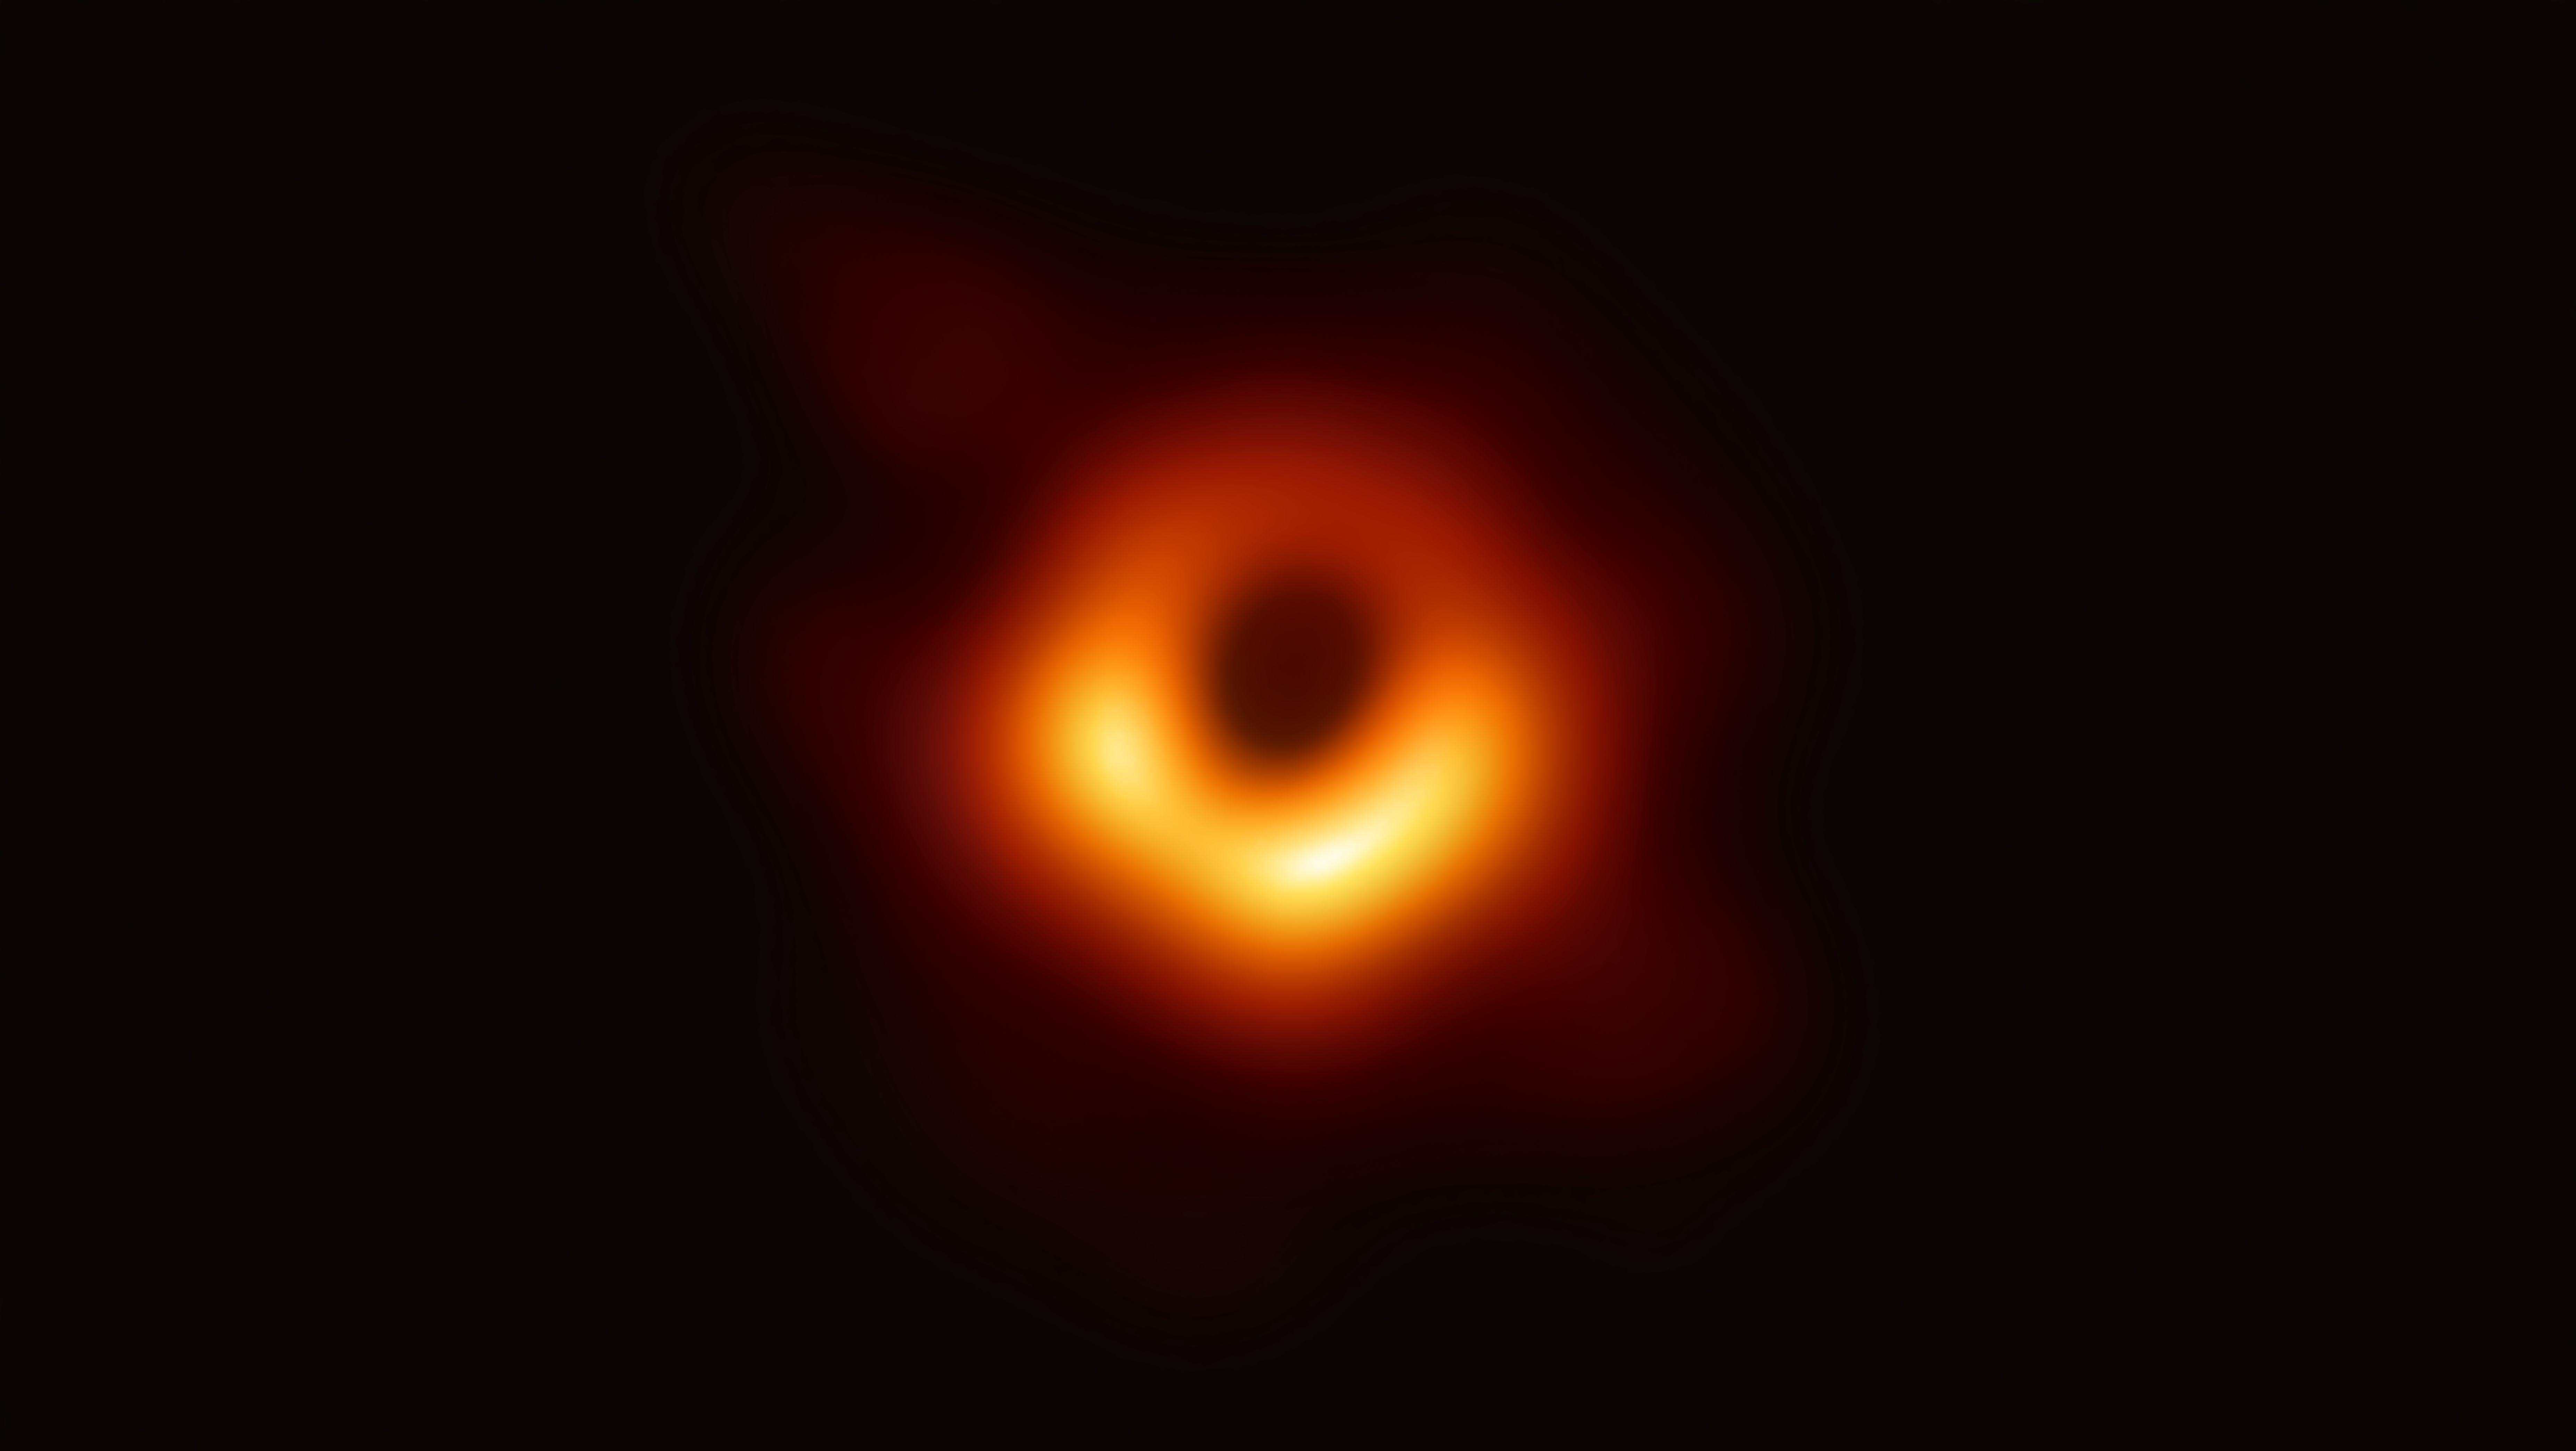 Event Horizon Telescope collaboration et al.